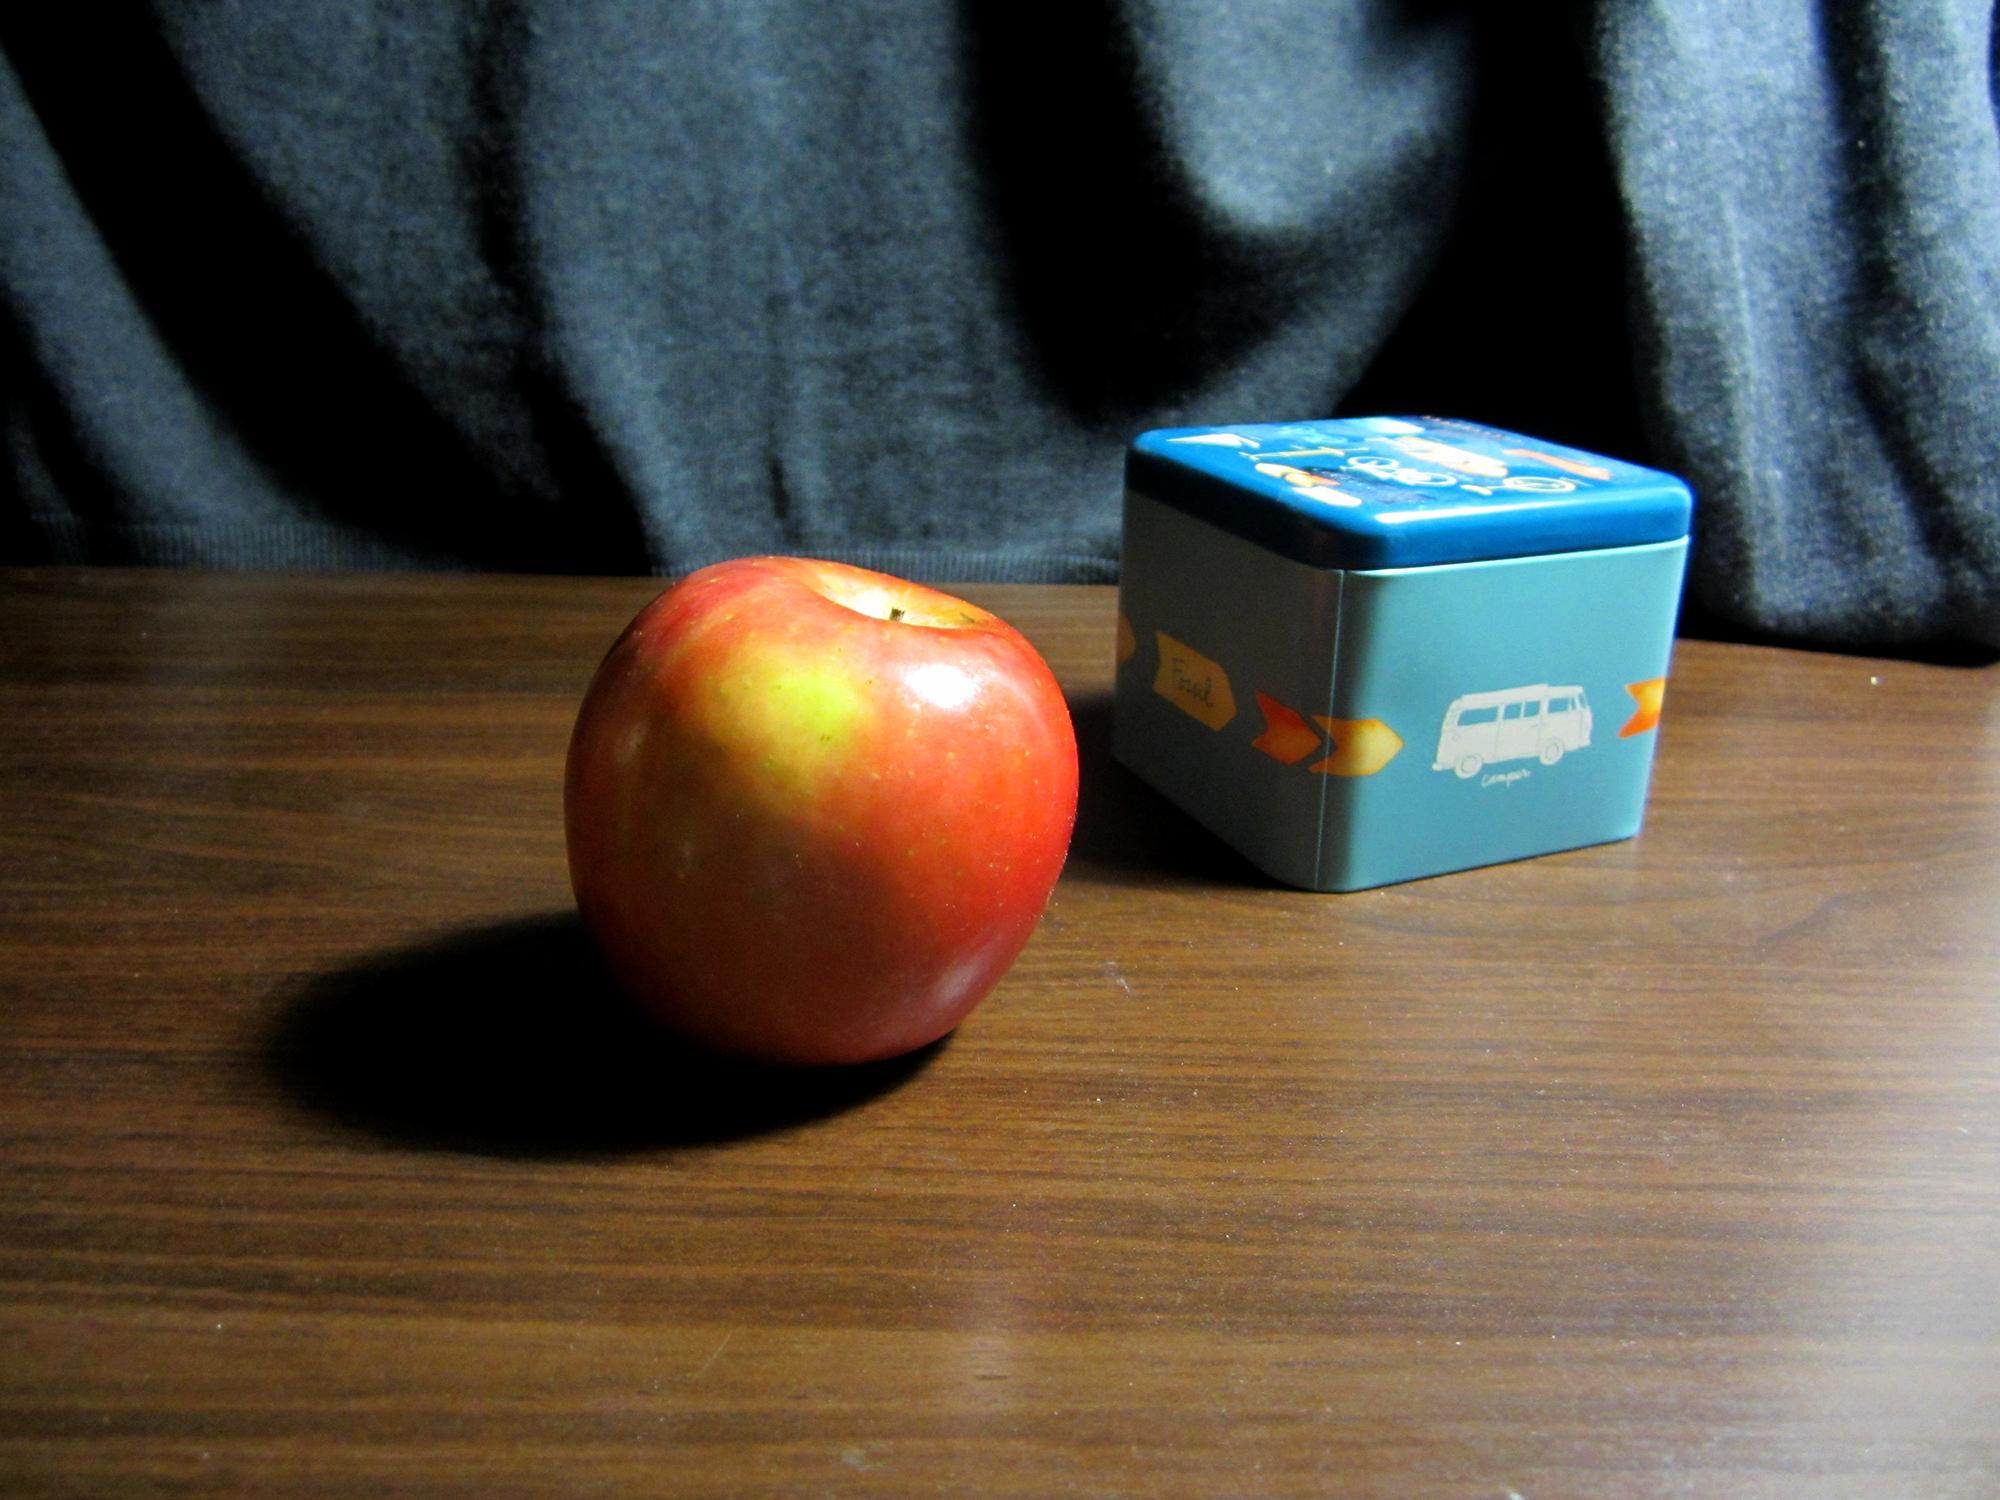 appleandbox_color2